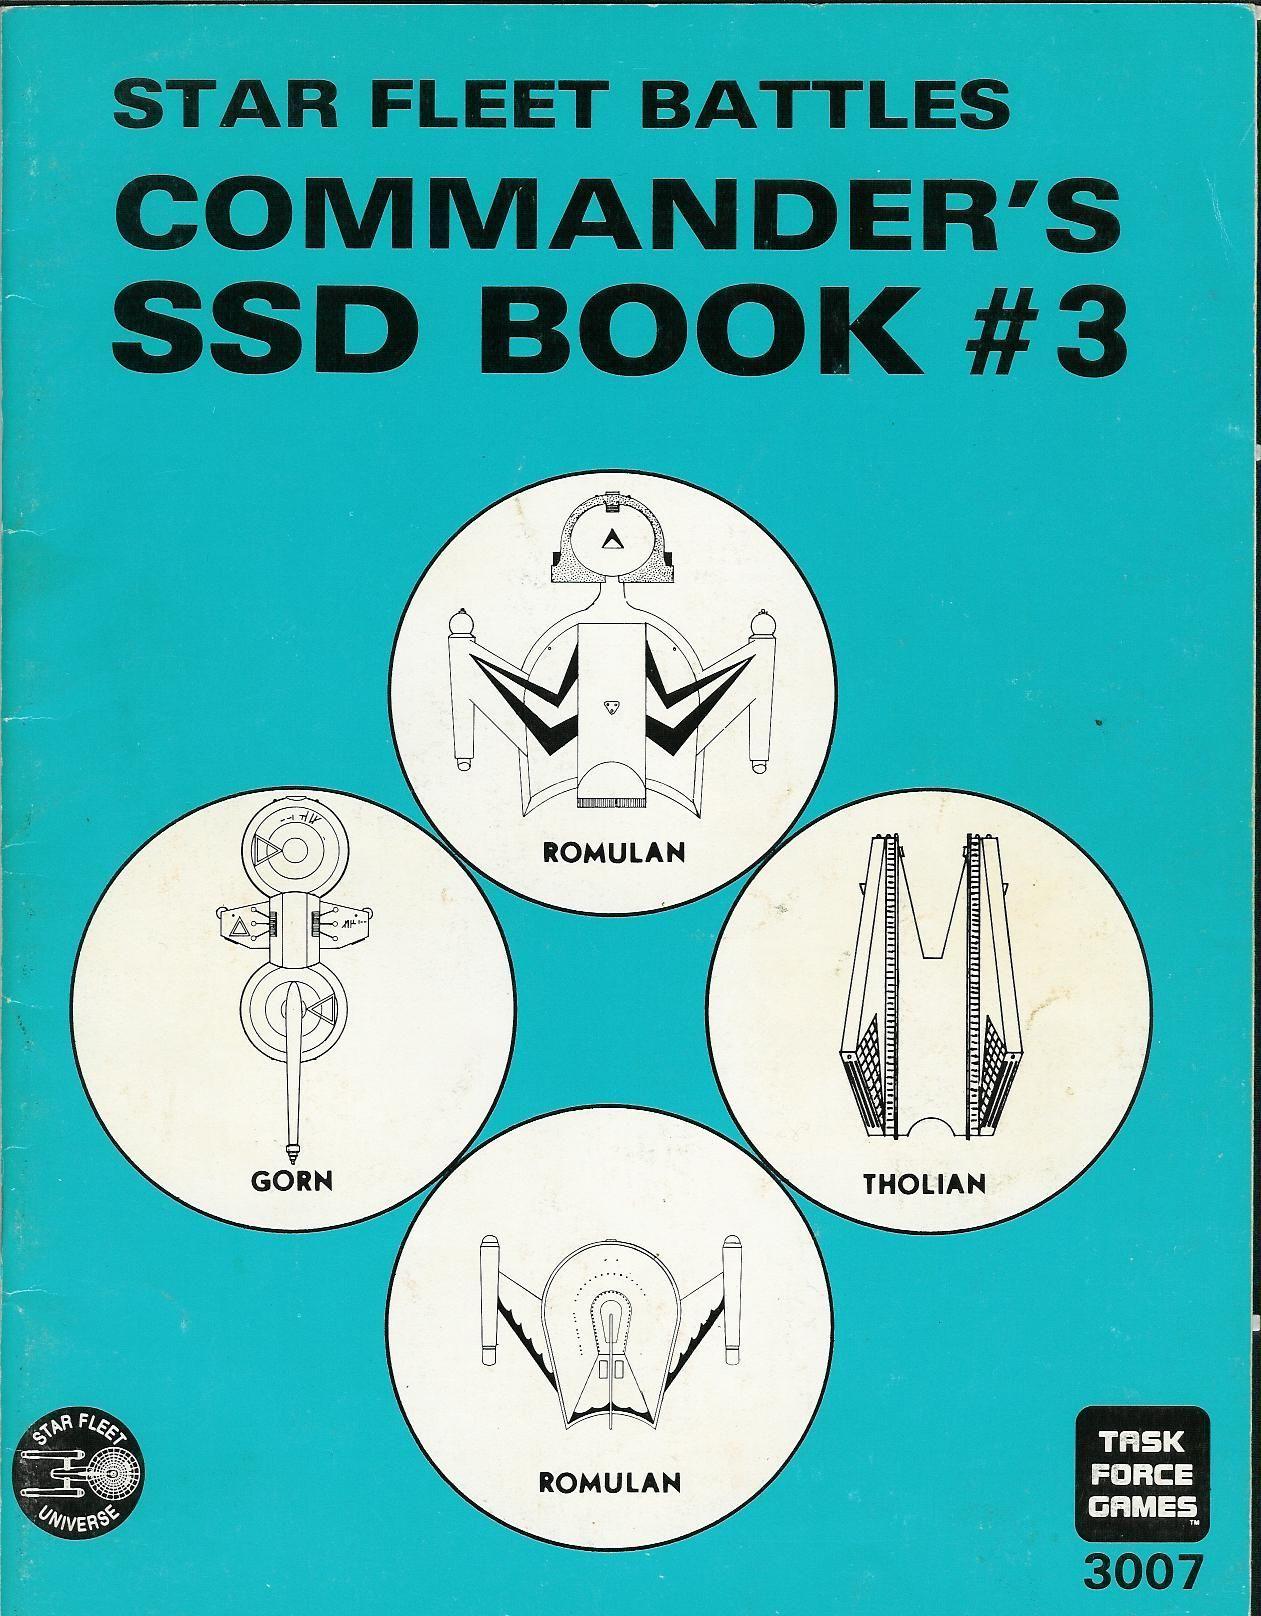 Star Fleet Battles: Commanders SSD Book #3